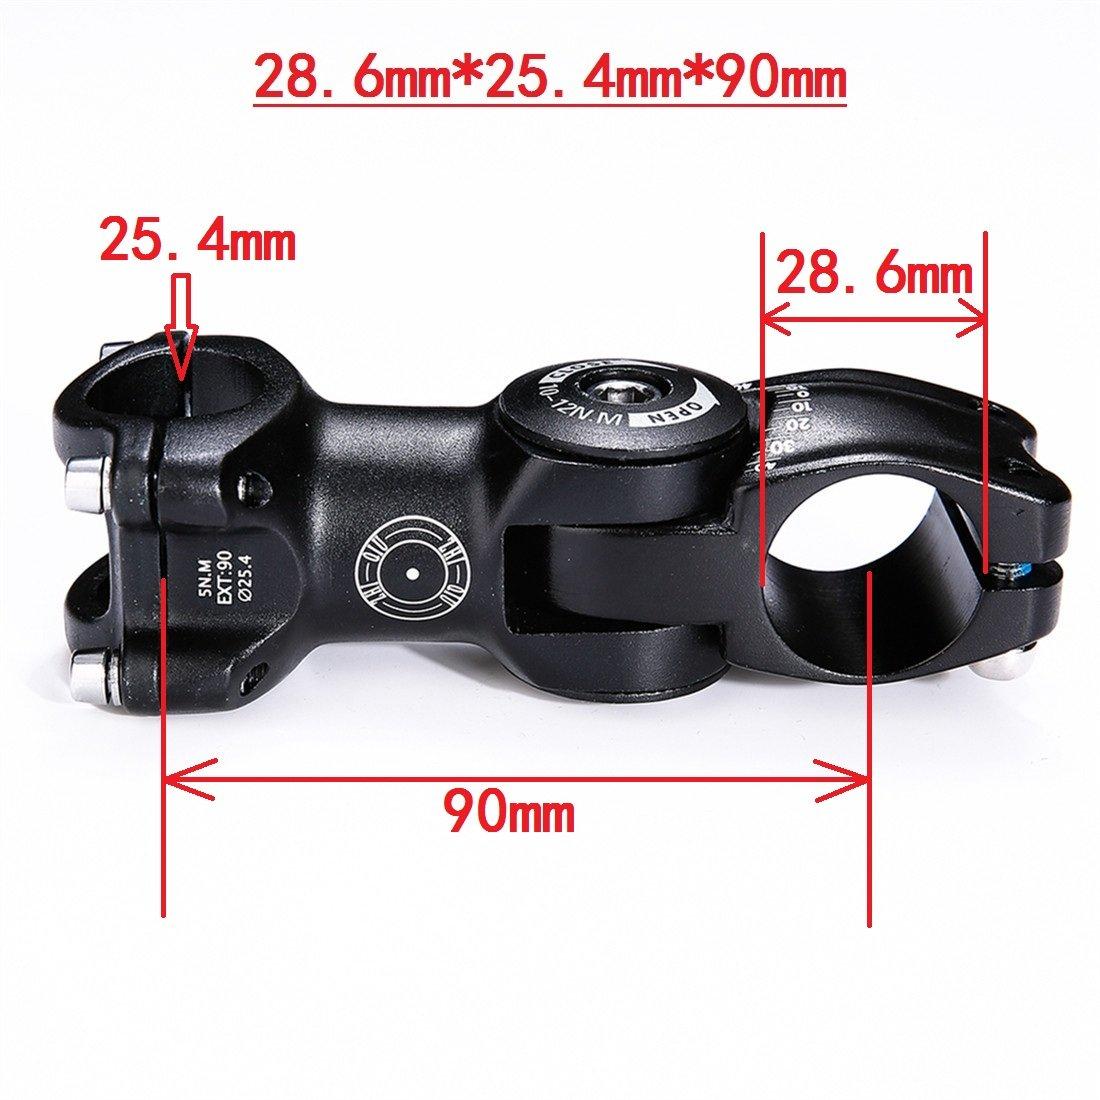 ZHIQIU 0-80 Degree 90mm 110mm Increase Adustable Stem Bike Fork Extender Bicycle Handlebar Rise Clamp Adaptor MTB Road Fixed Gear Aluminium Alloy Head Up Adapter Flexible